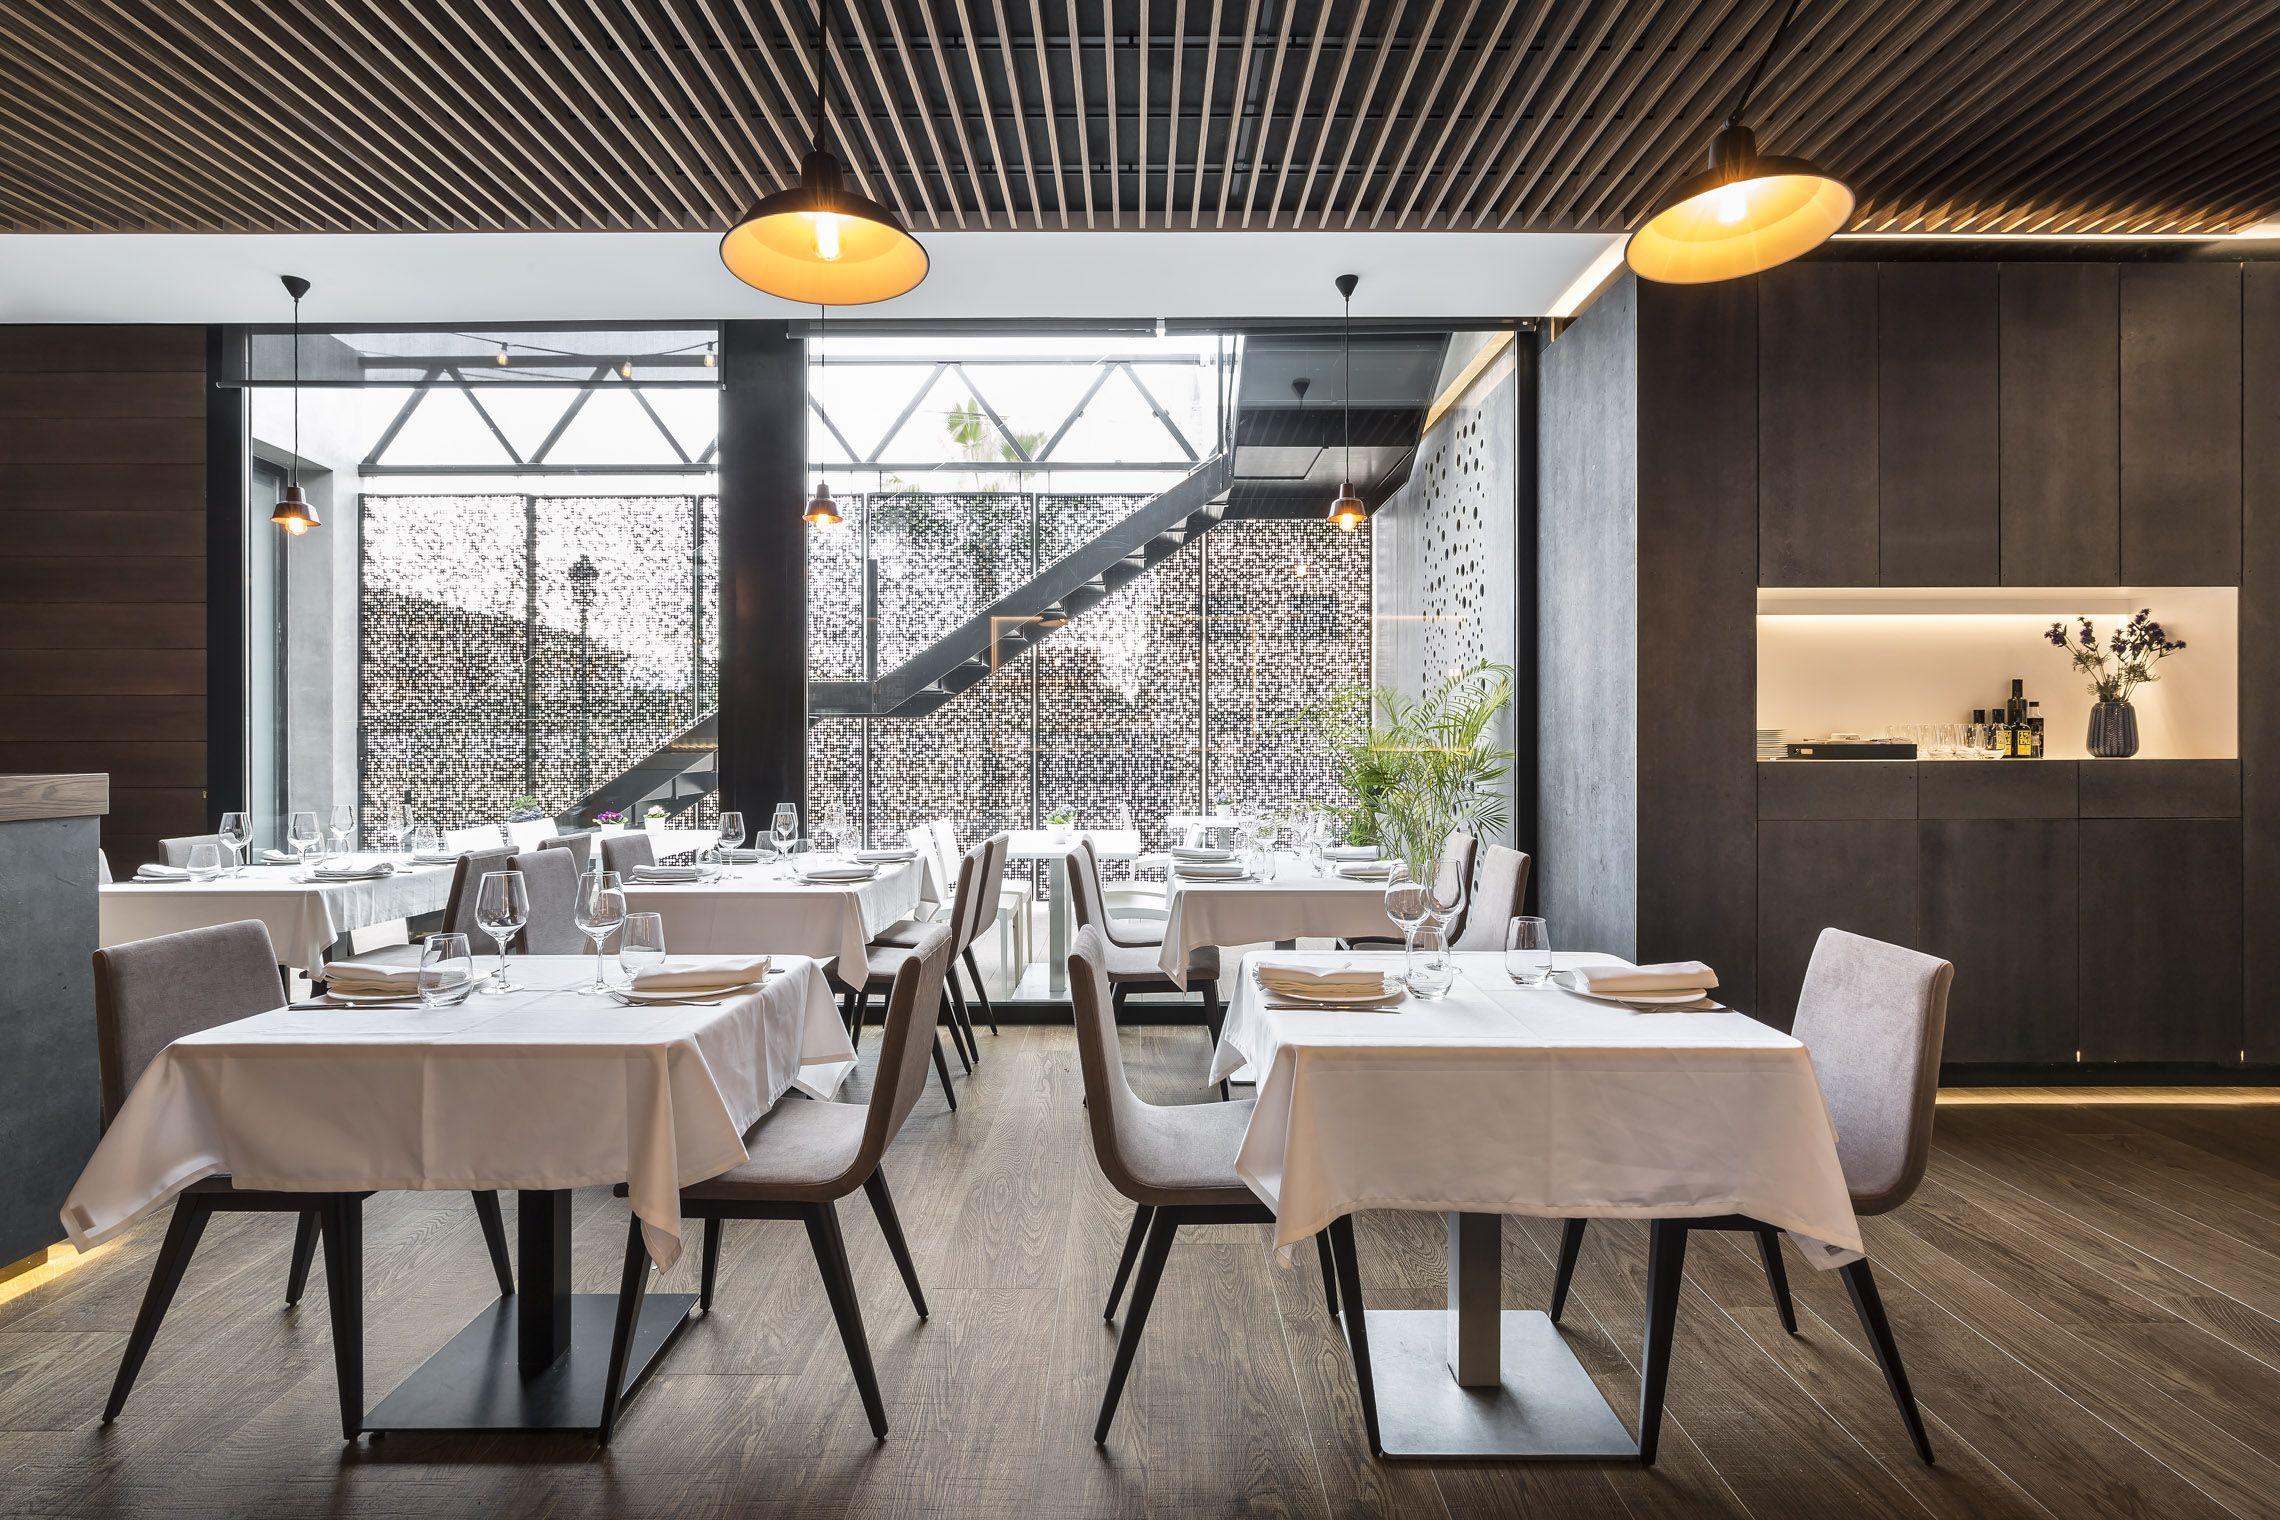 restaurante con viroc falso techo hunter douglas de madera grid y pavimento porcelanas restaurant